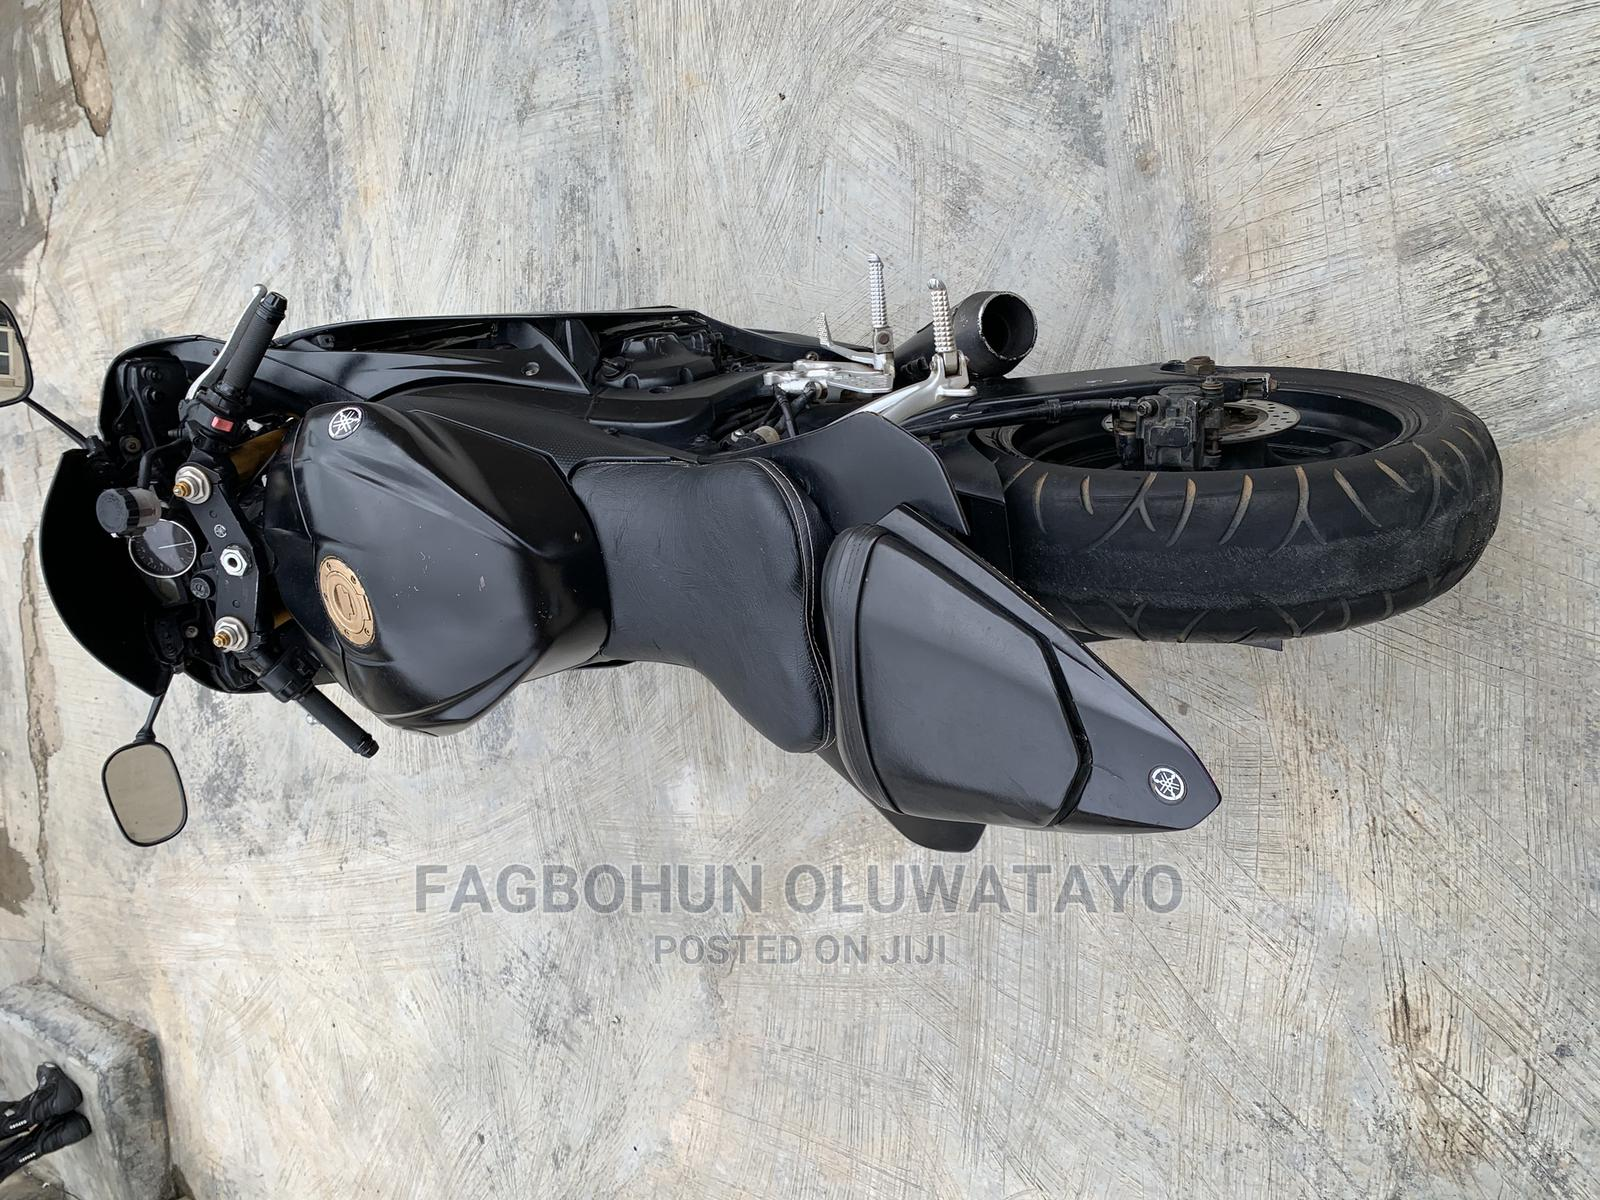 Yamaha R6 2008 Black | Motorcycles & Scooters for sale in Ikorodu, Lagos State, Nigeria